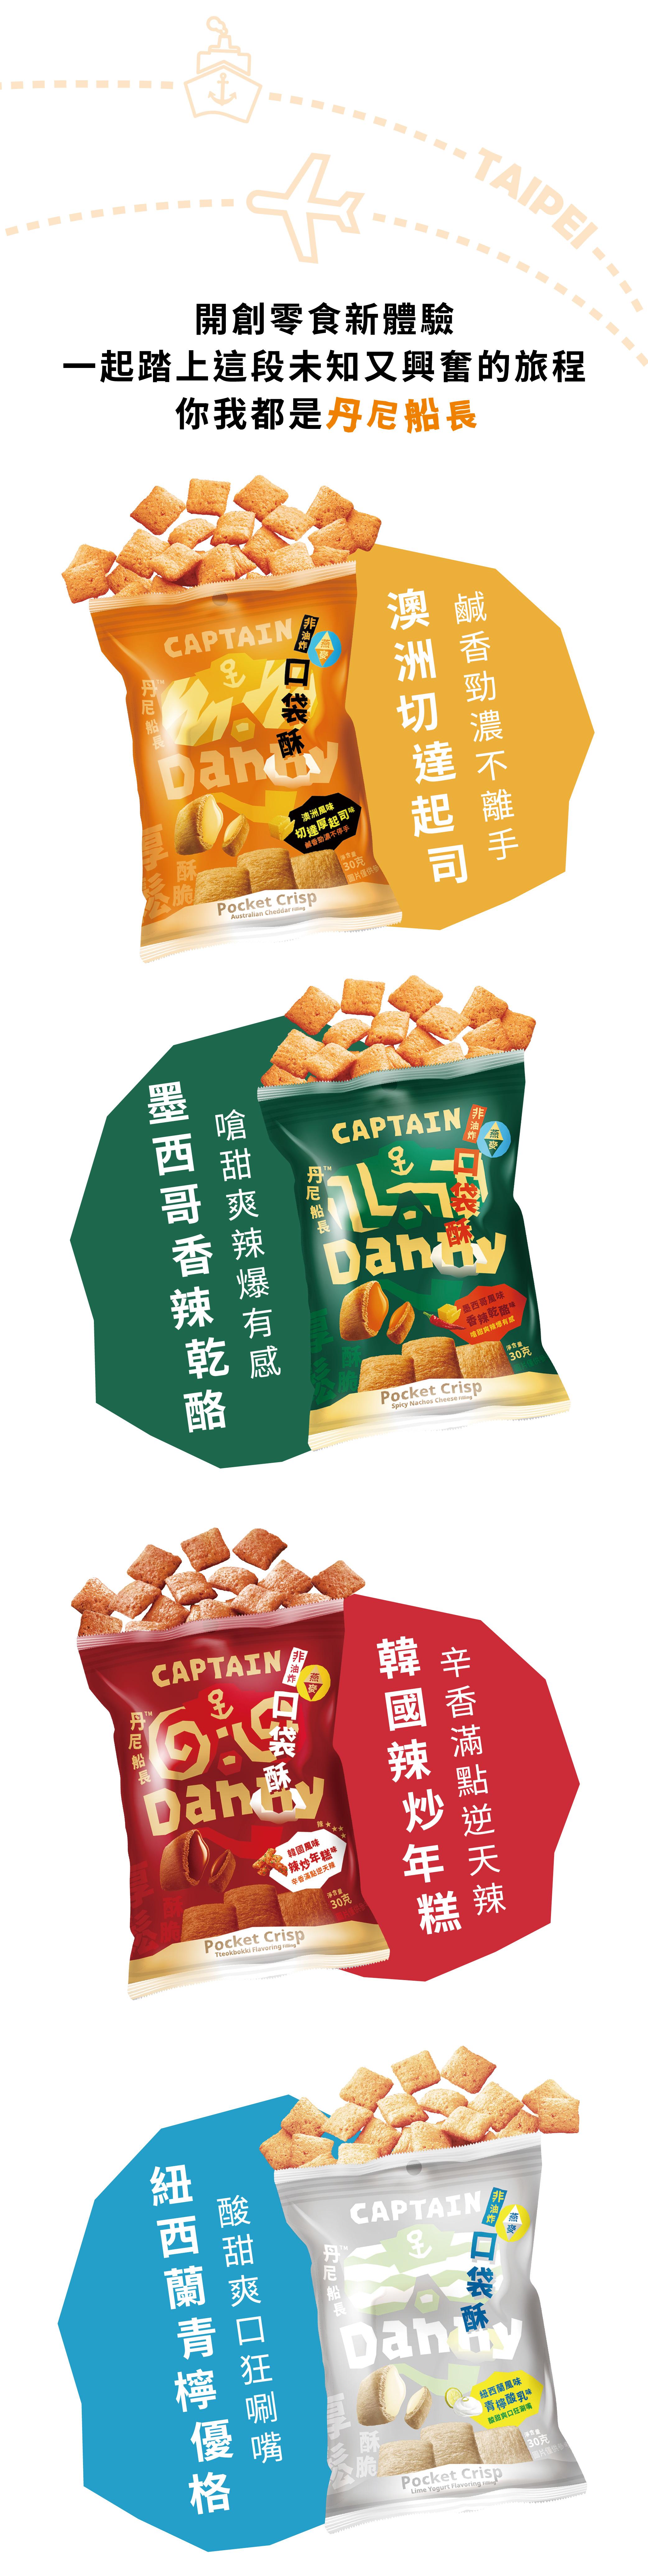 CAPTAIN Danny丹尼船長 - 品牌故事